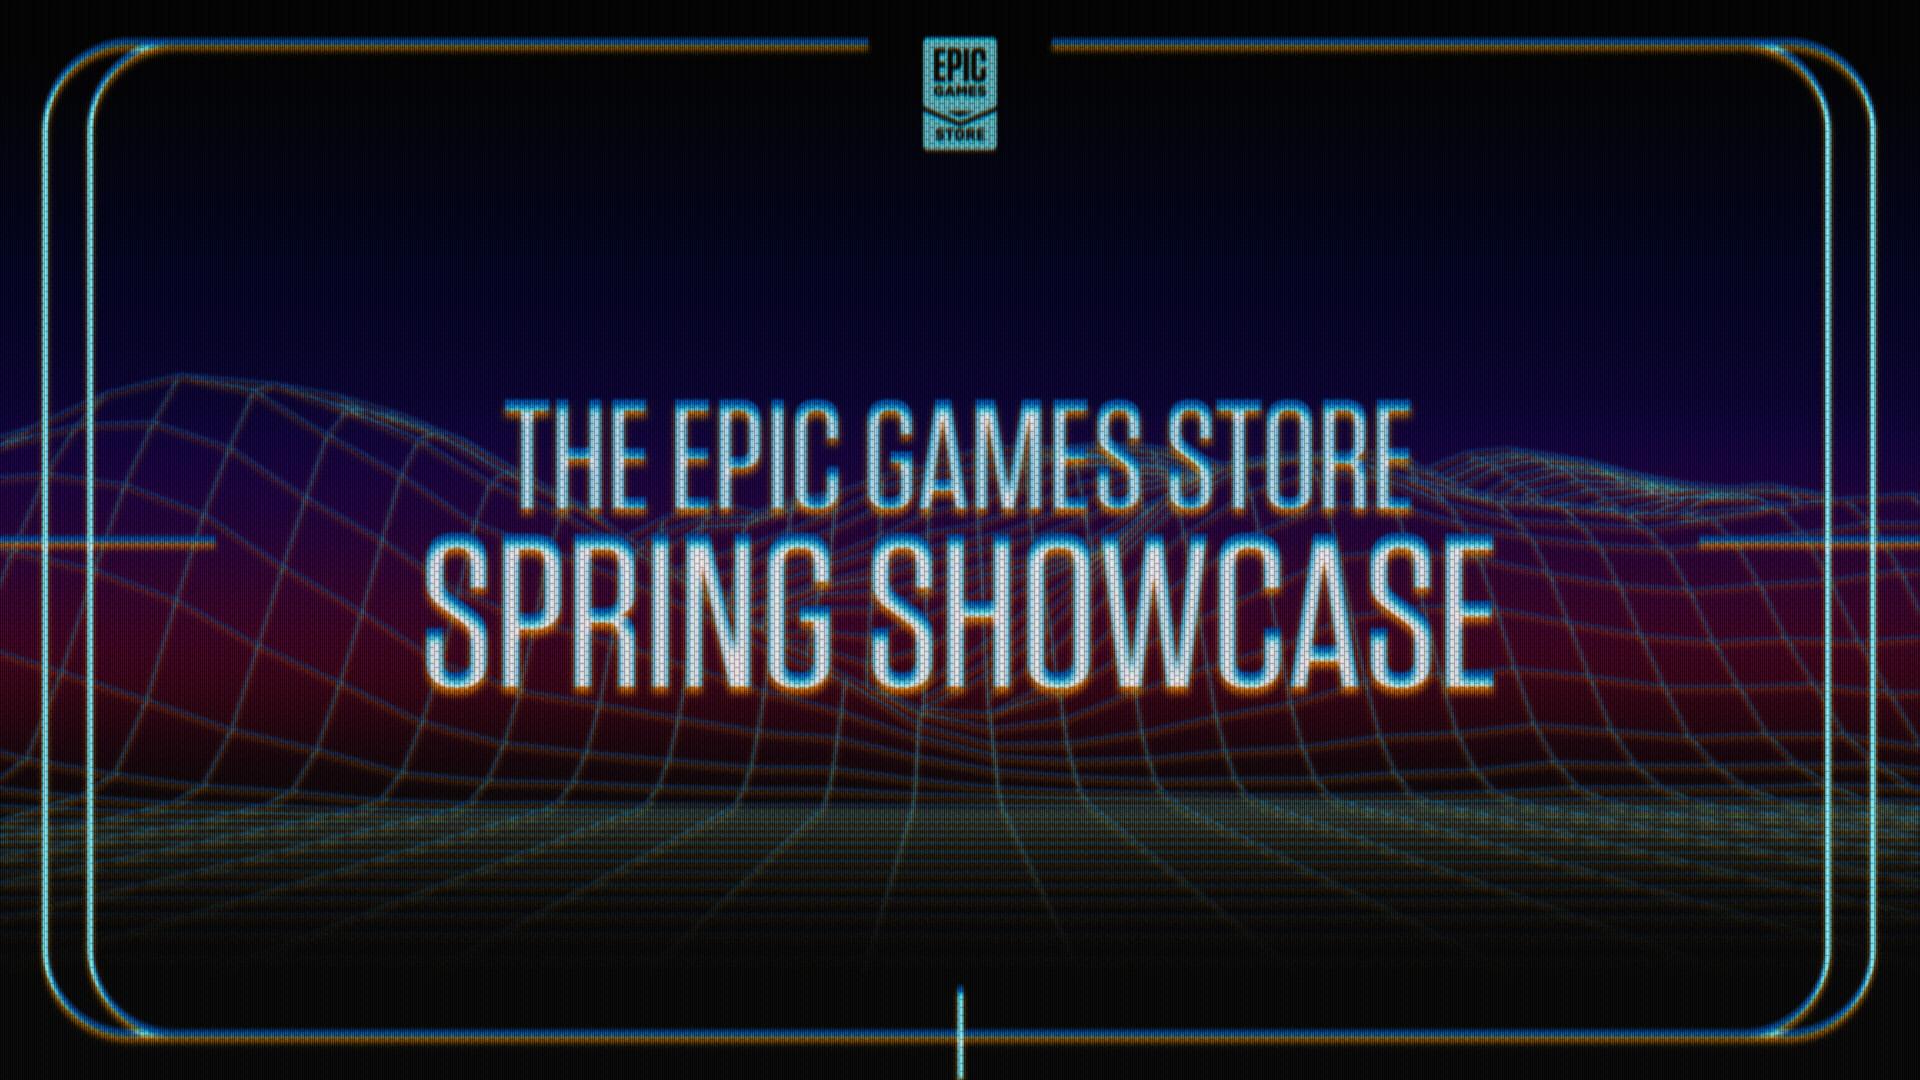 en egs springshowcase 1920x1080 1920x1080 02389c6fbf3b Epic Games